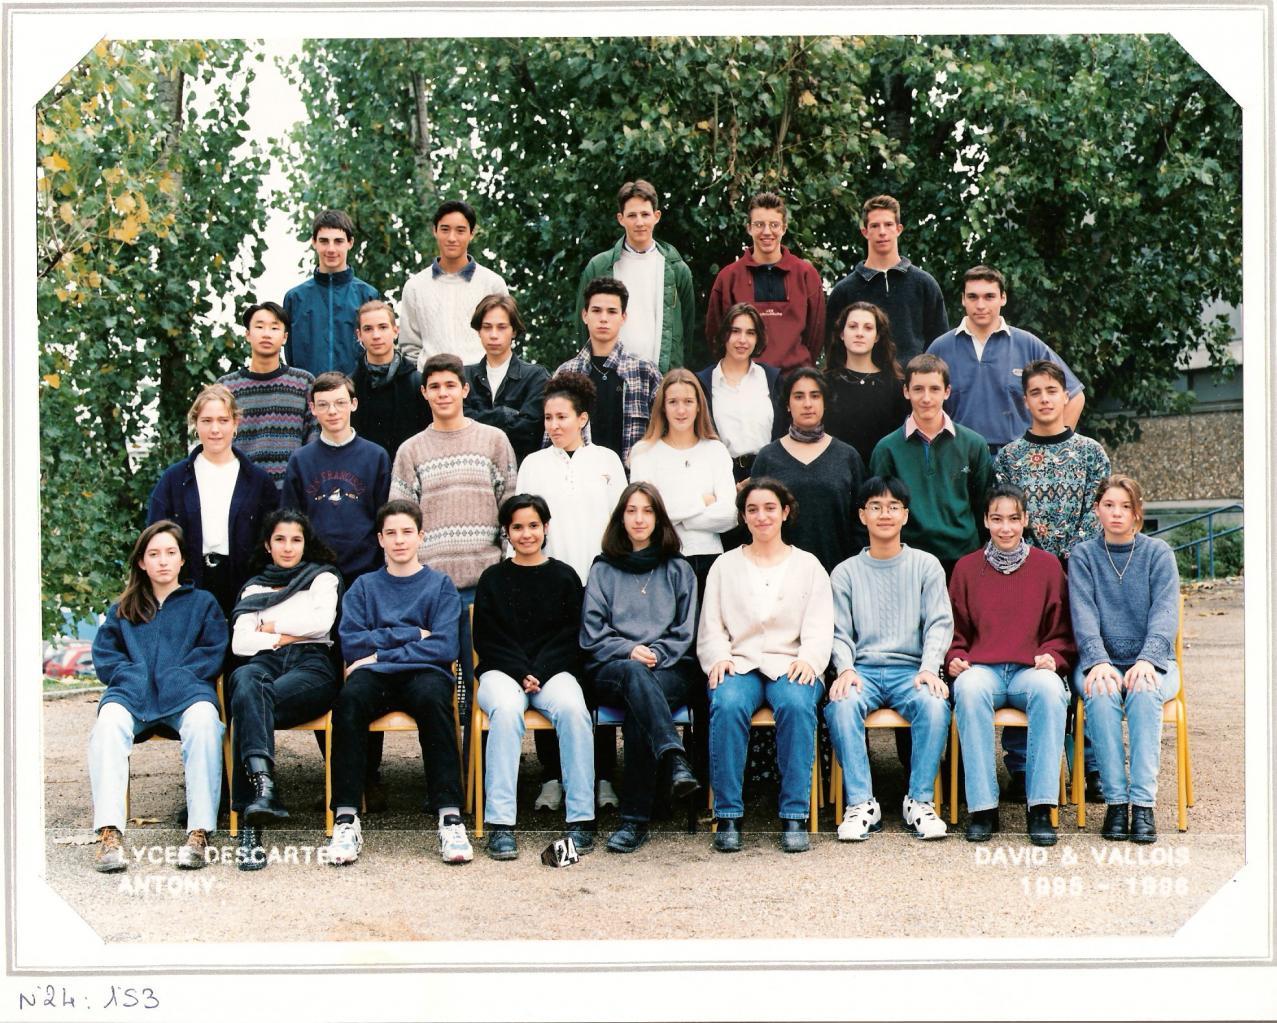 1996 - 1S3